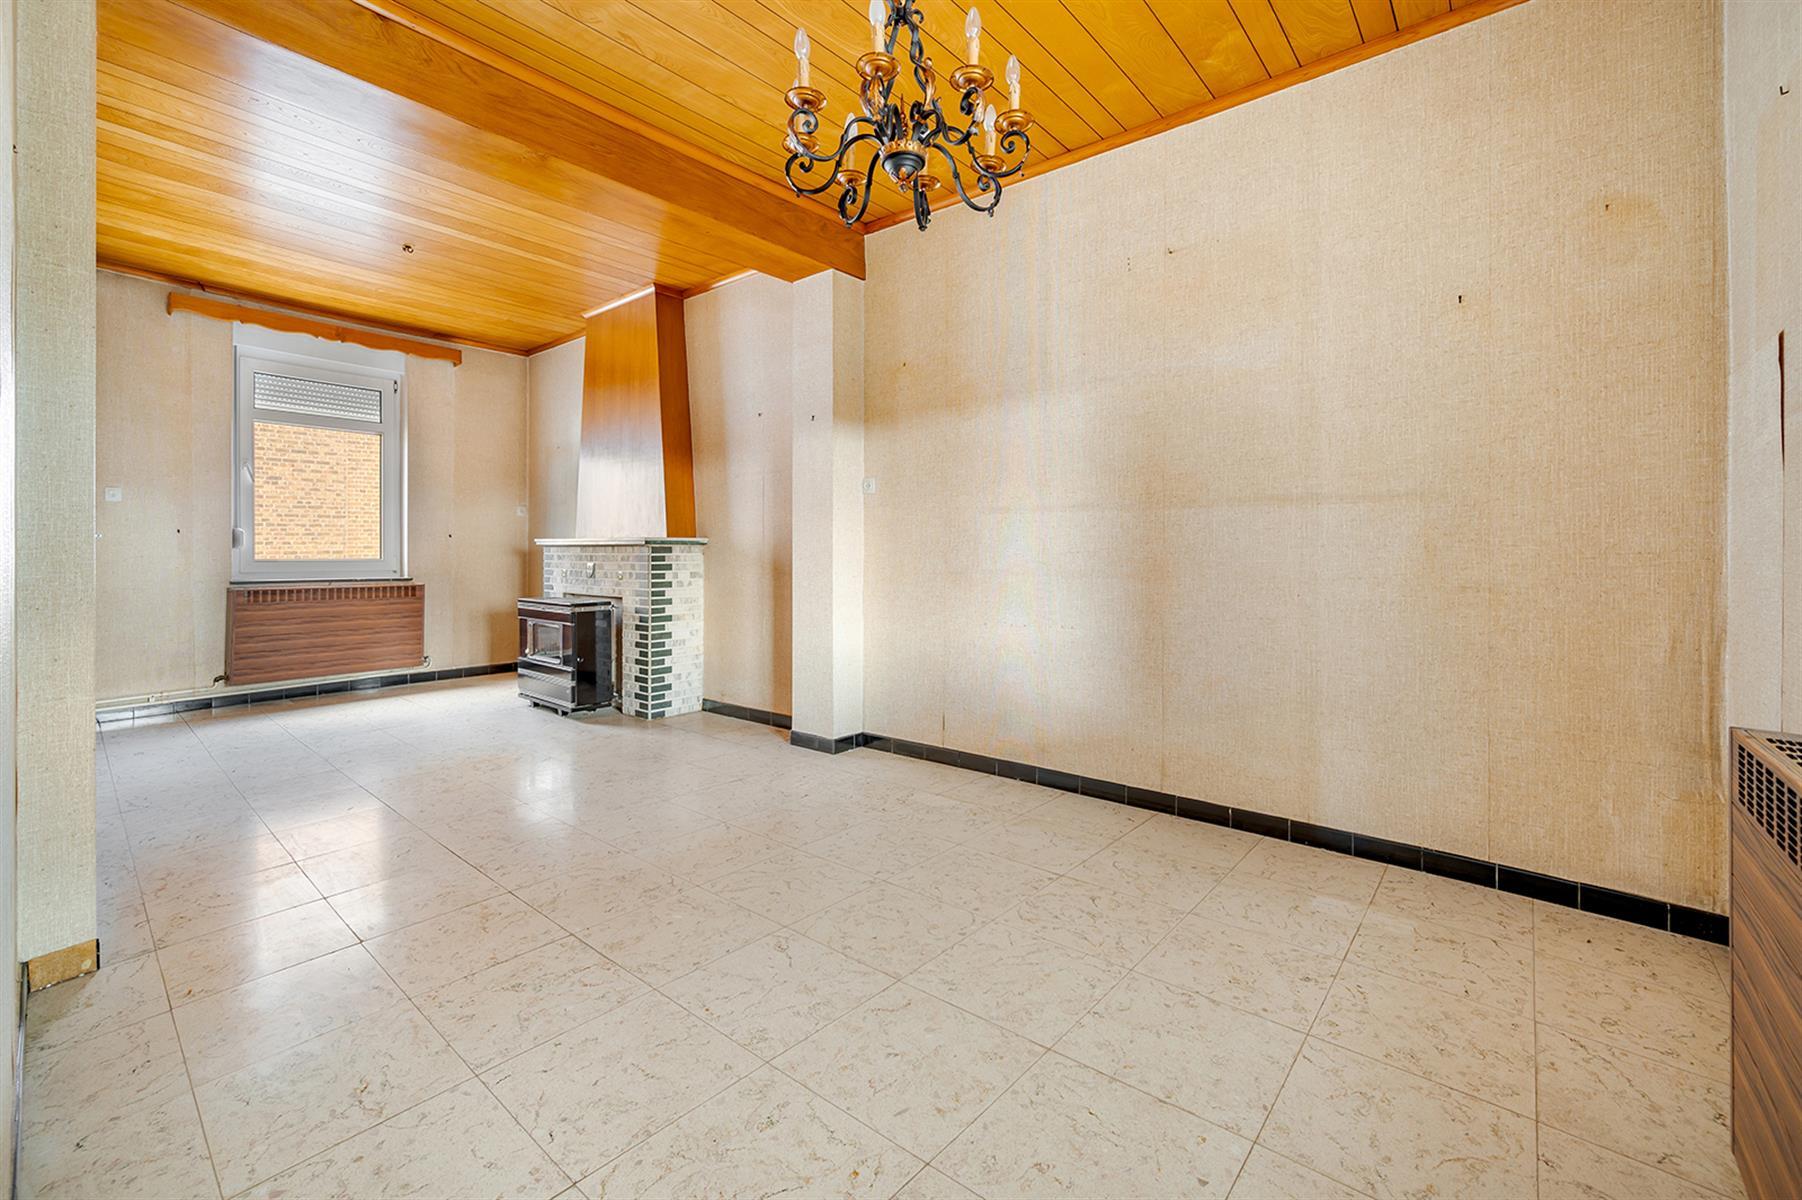 Maison - Remicourt - #4293207-6